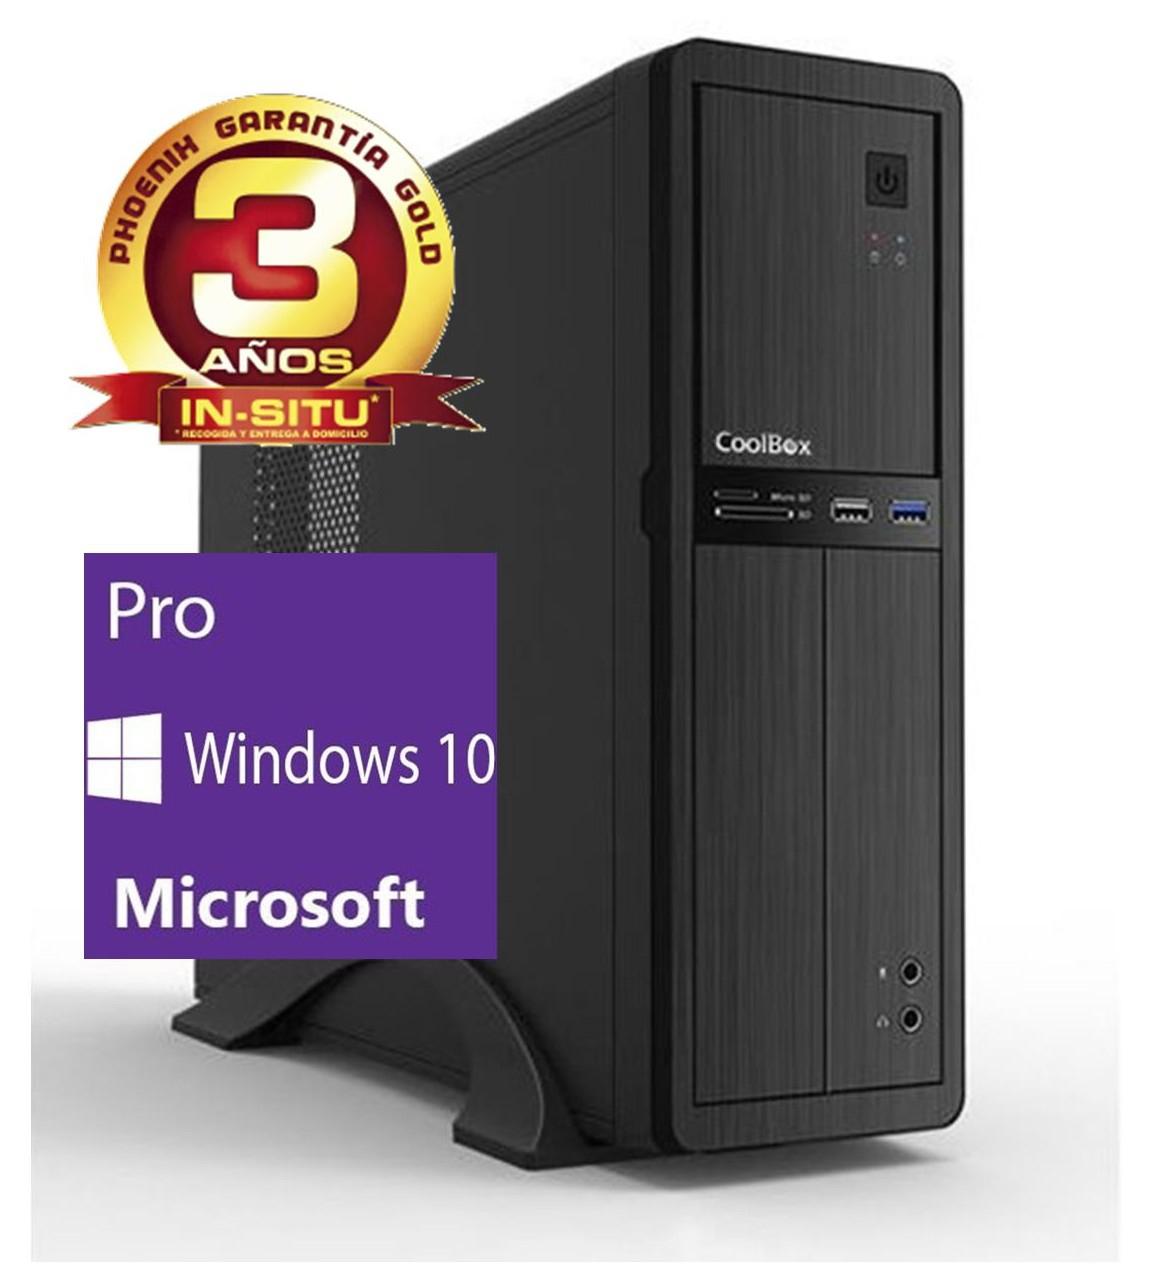 ORDENADOR DE OFICINA PHOENIX OBERON PRO INTEL CORE I3 6º GEN 4GB DDR4 500 GB RW MICRO ATX SLIM WINDOWS 10 PROFESIONAL PC SOBREMESA